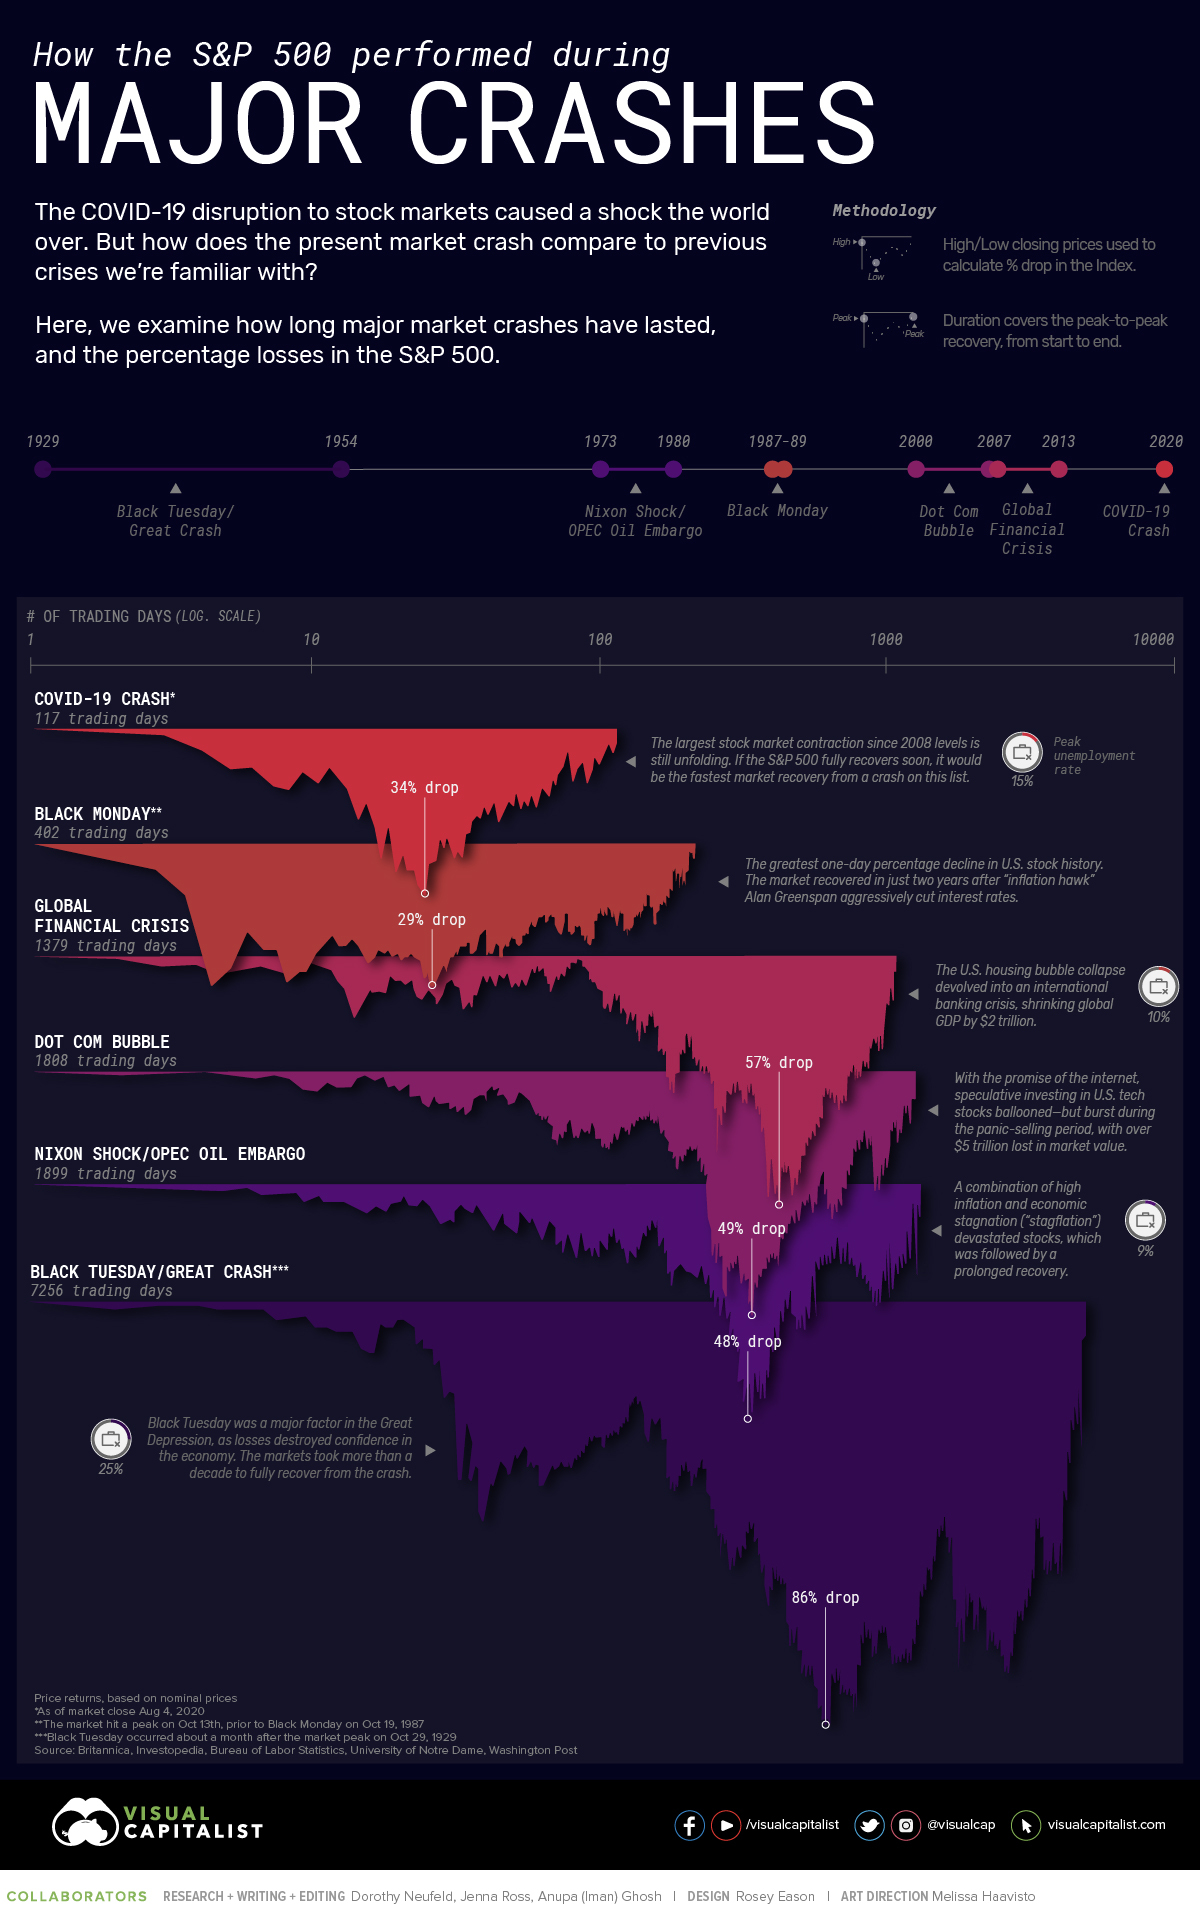 Major Stock Market Crashes